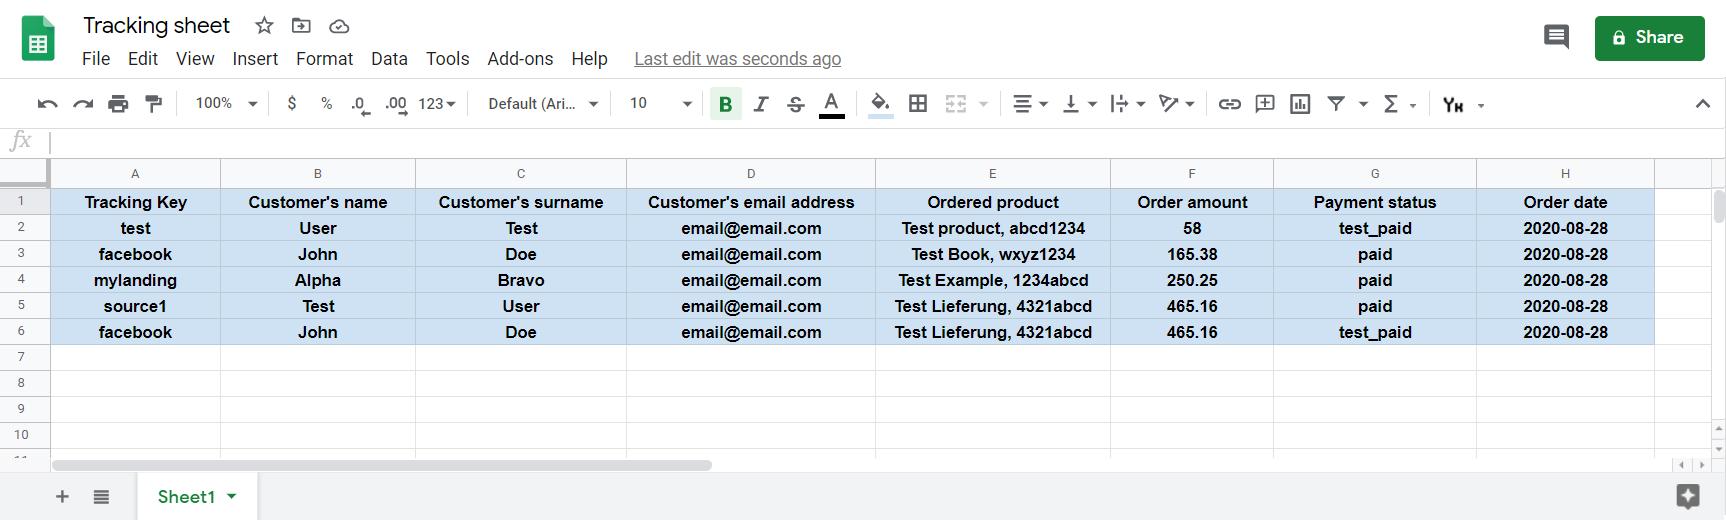 Metadata examples